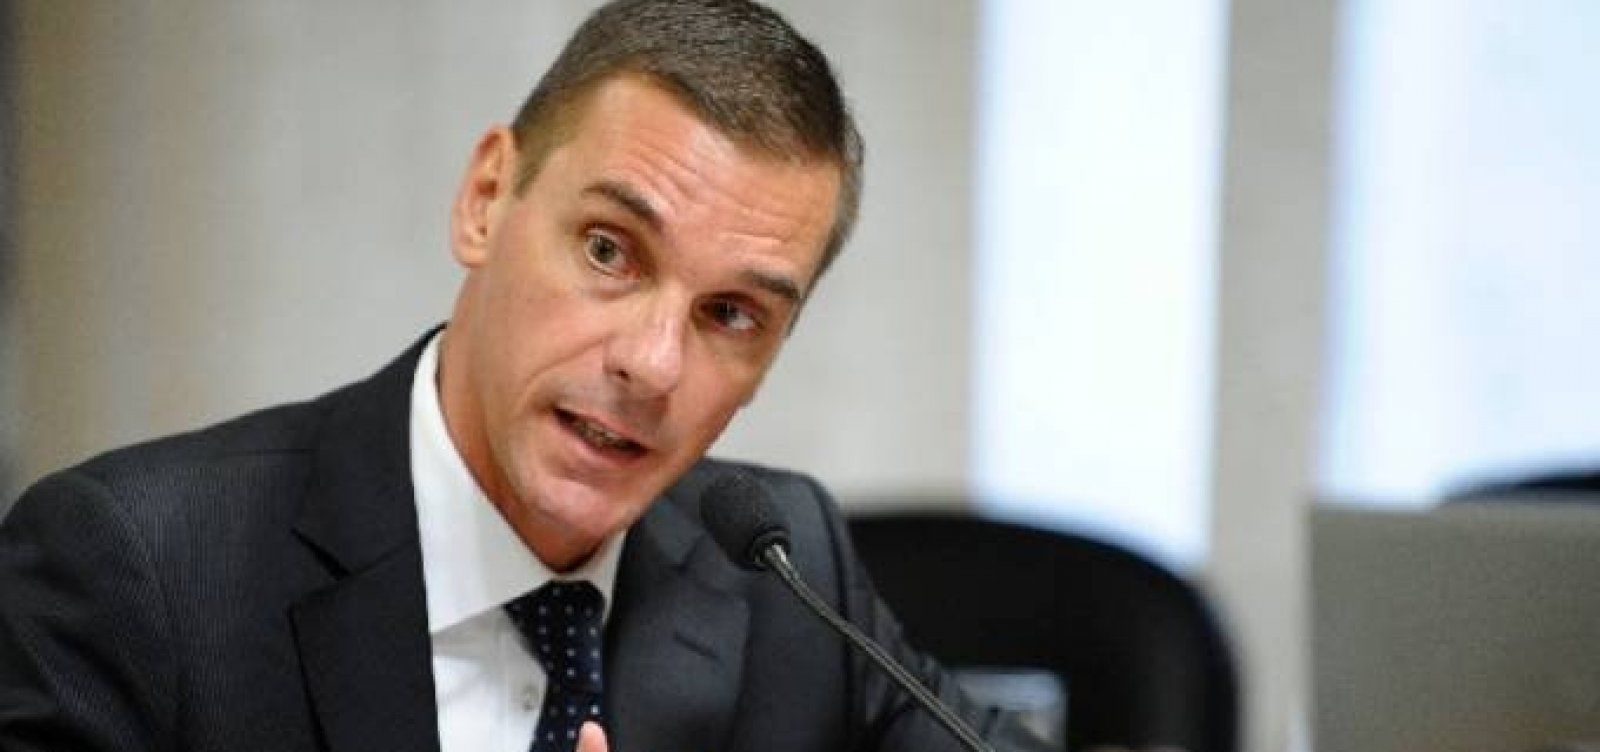 [Bolsonaro pediu a Guedes demissão do presidente do BB, informa Planalto]